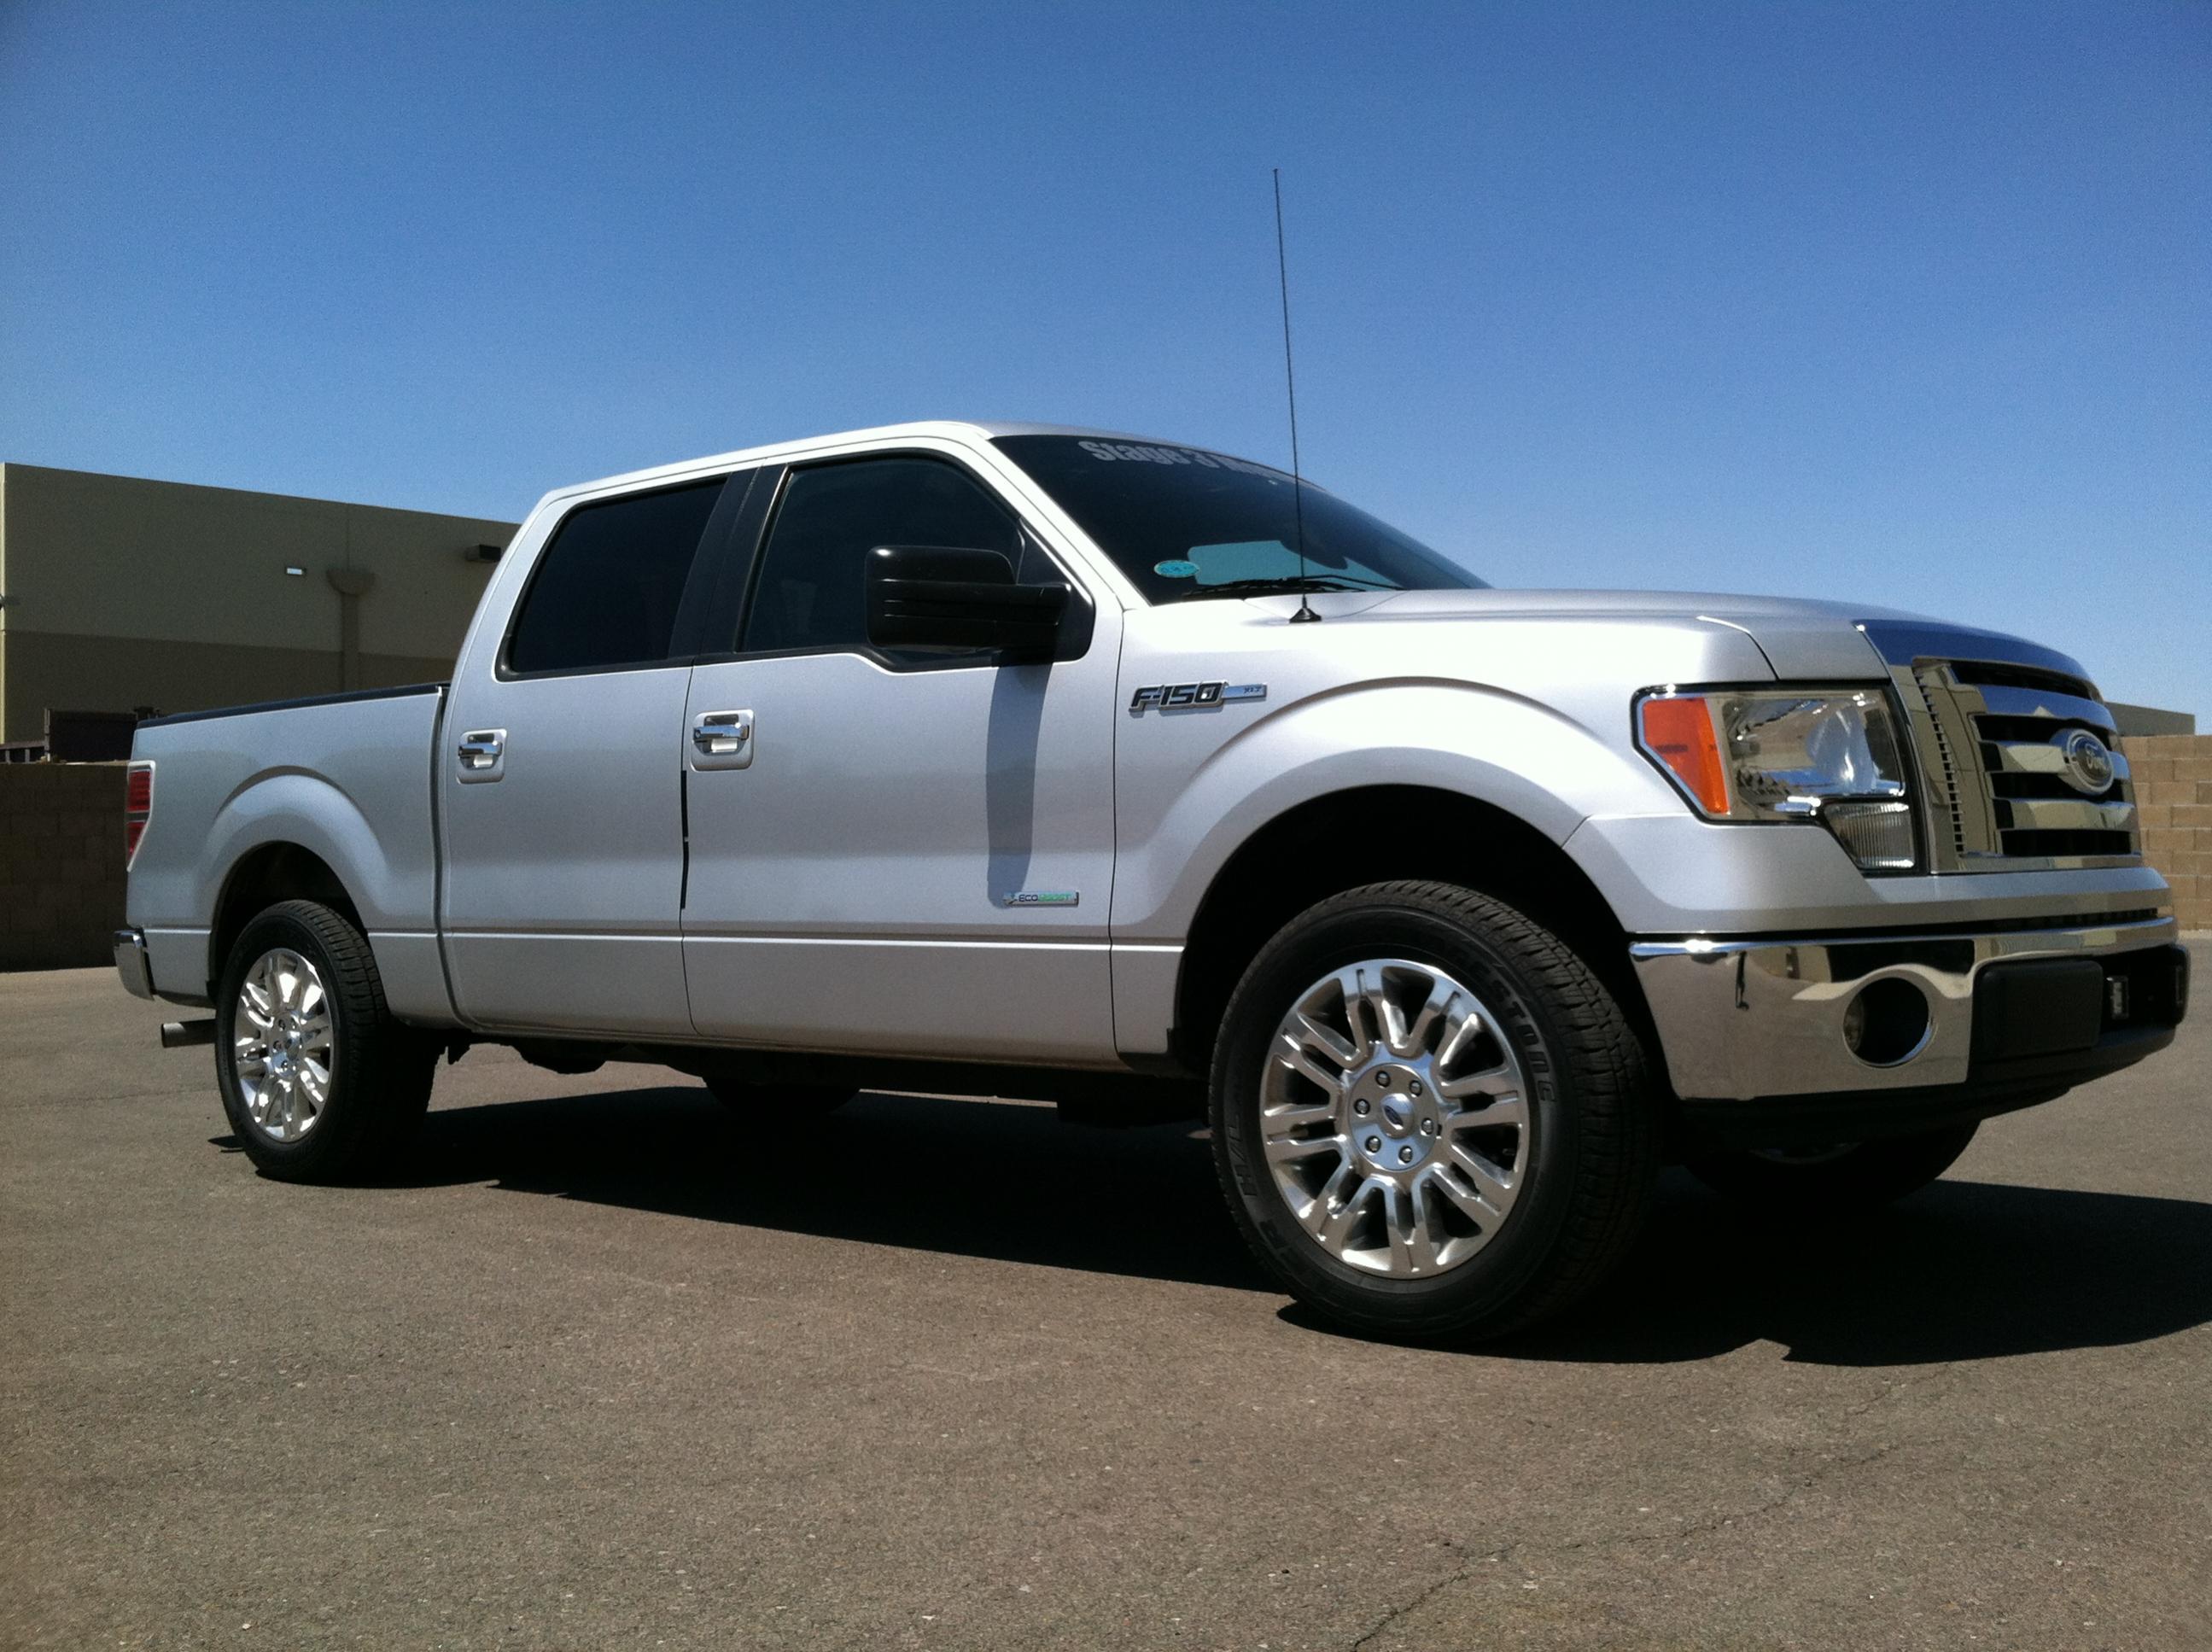 name f150 20 wheels ford oem jpg views 66739 size 521 4 kb